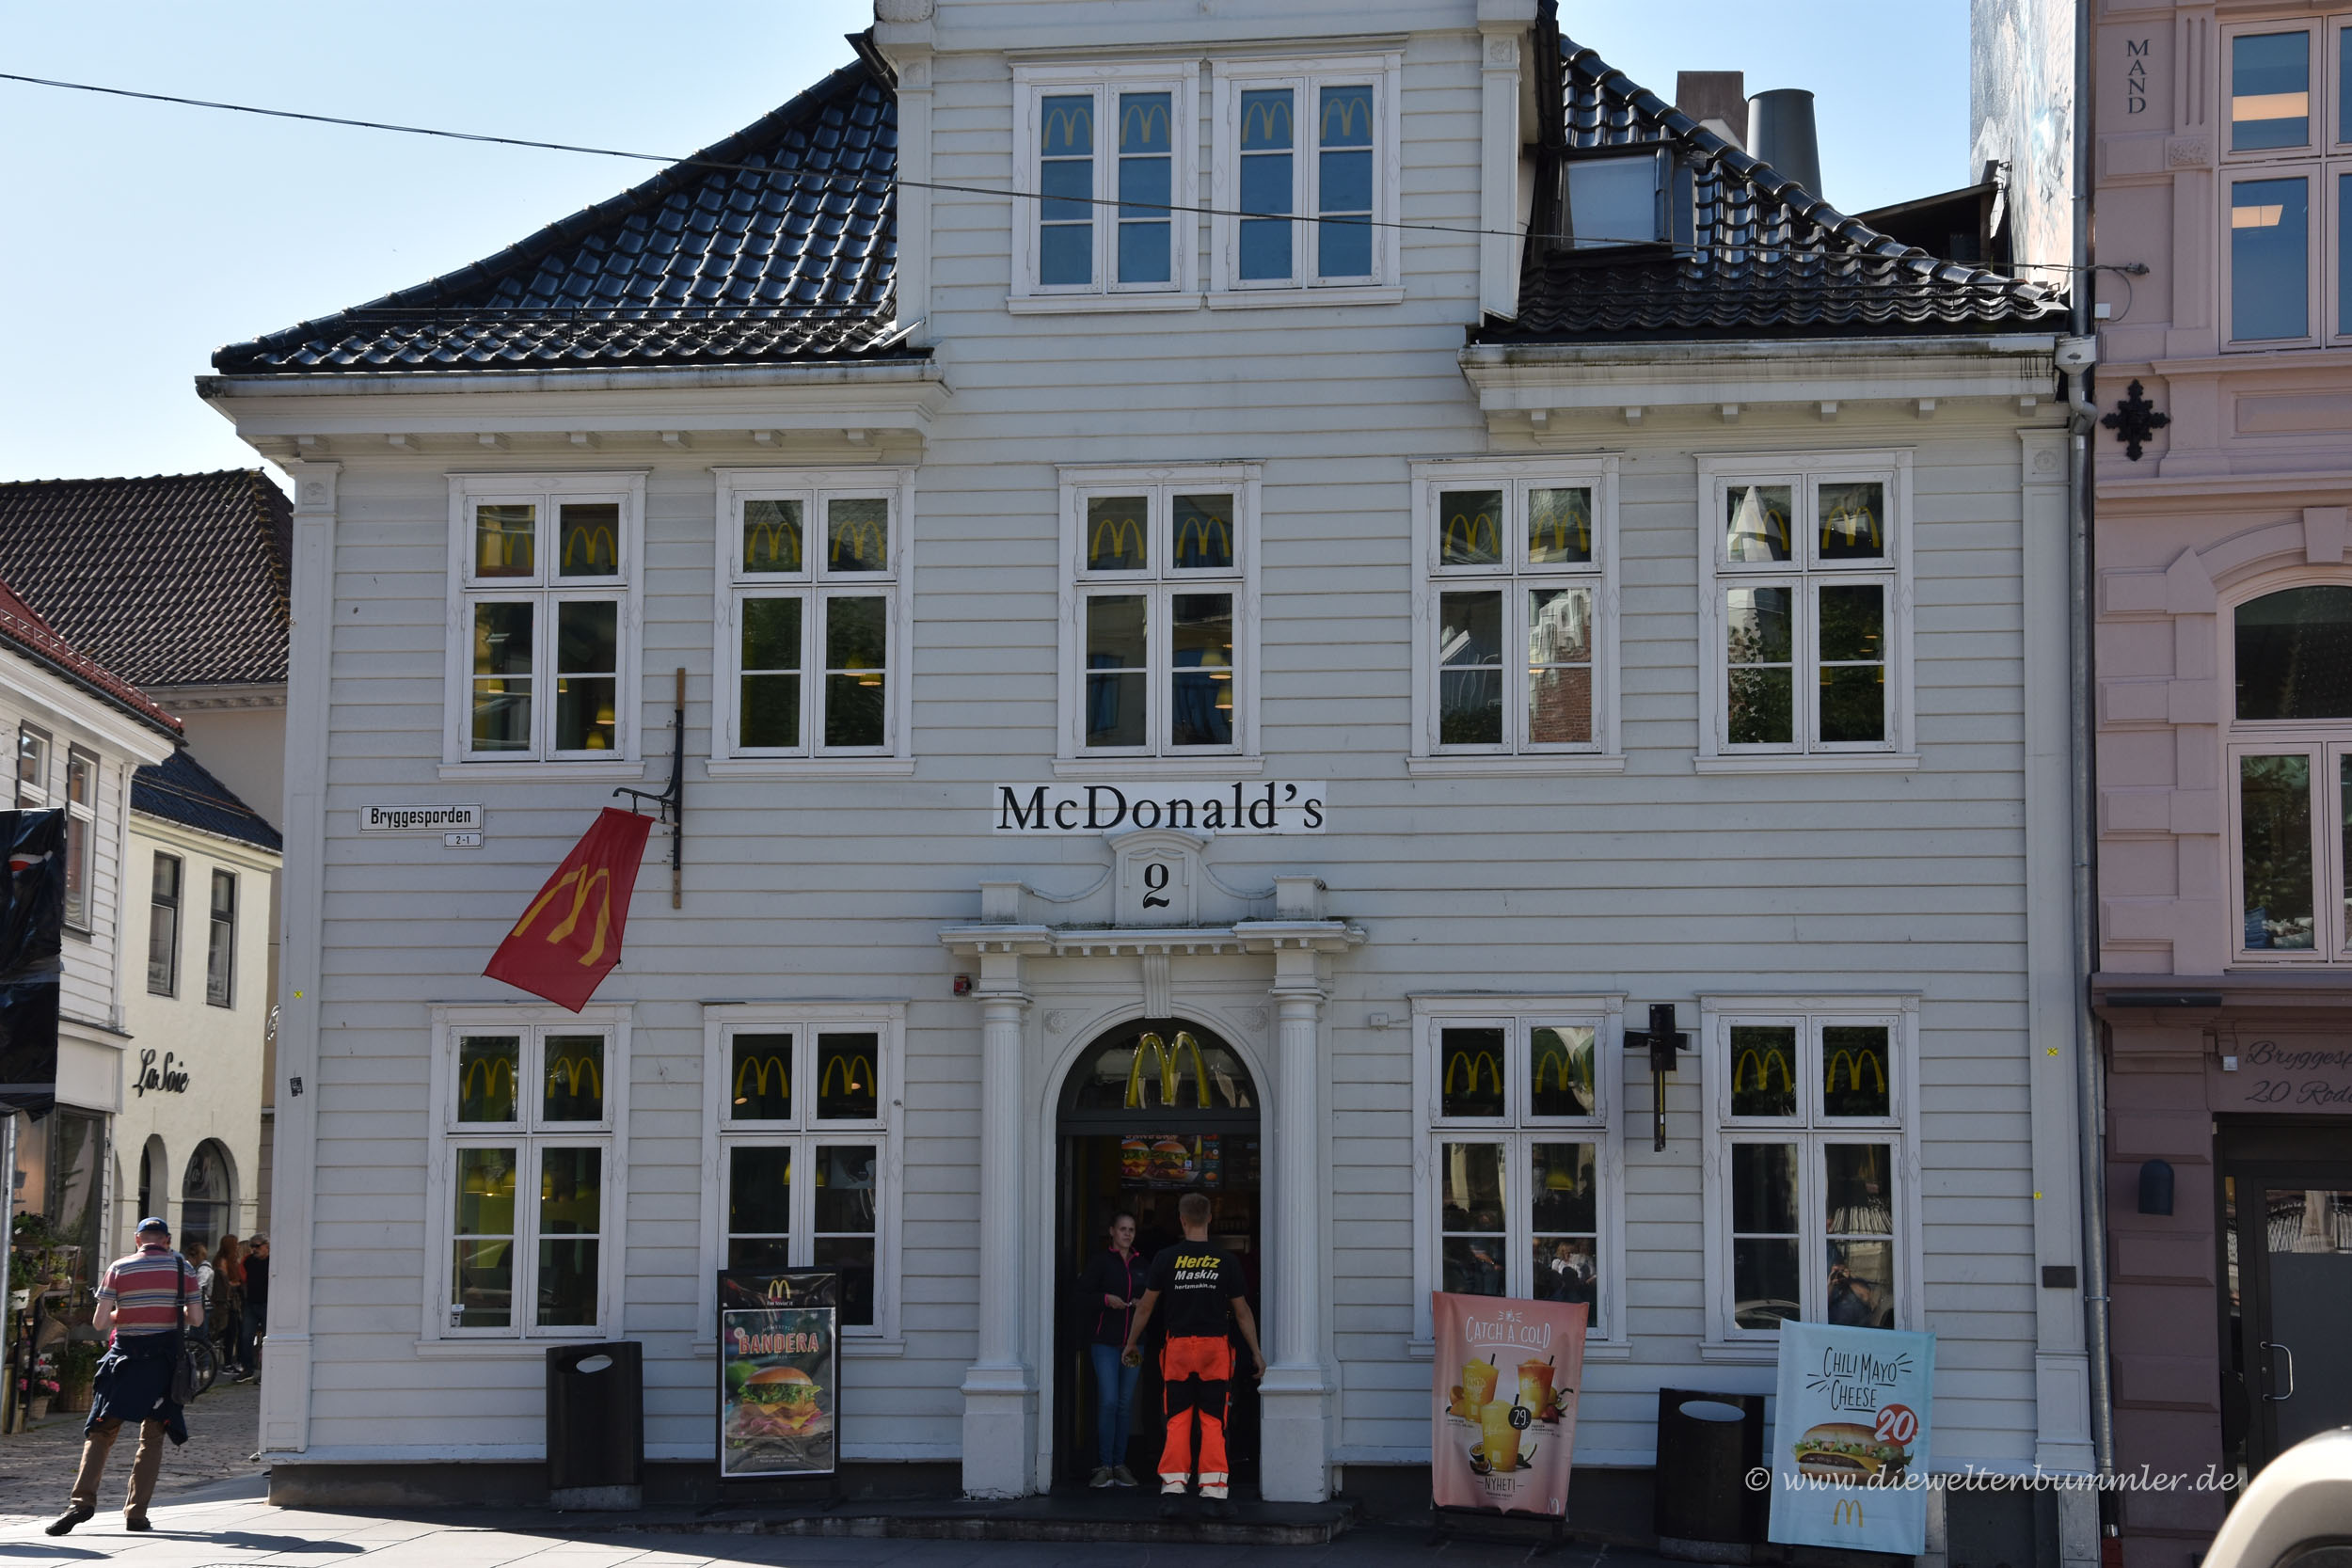 Selbst McDonalds sieht anders aus